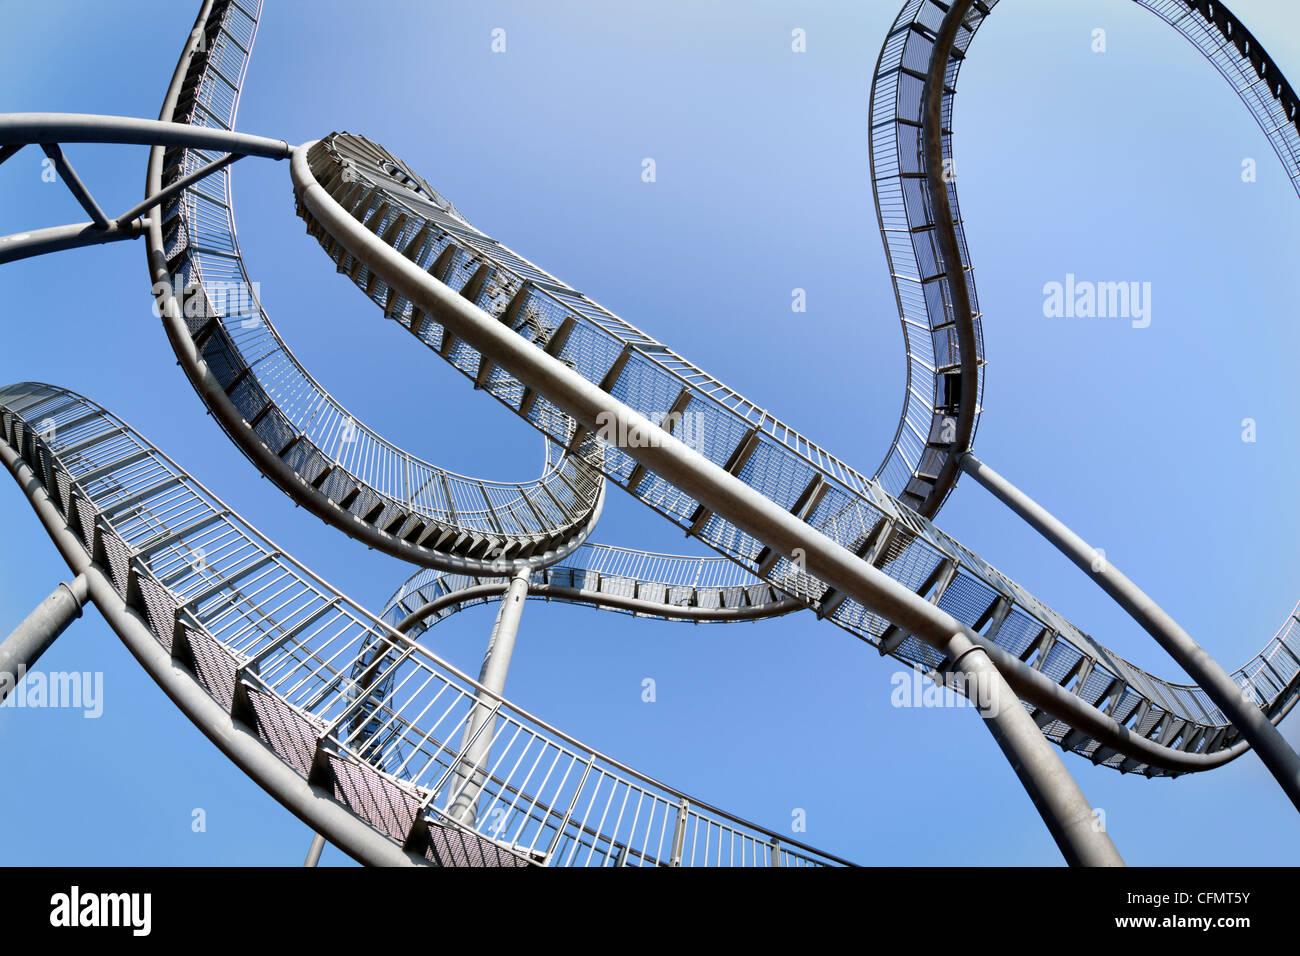 fisheye view of Tiger & Turtle, pedestrian rollercoaster, Duisburg-Wanheim, Germany Stock Photo